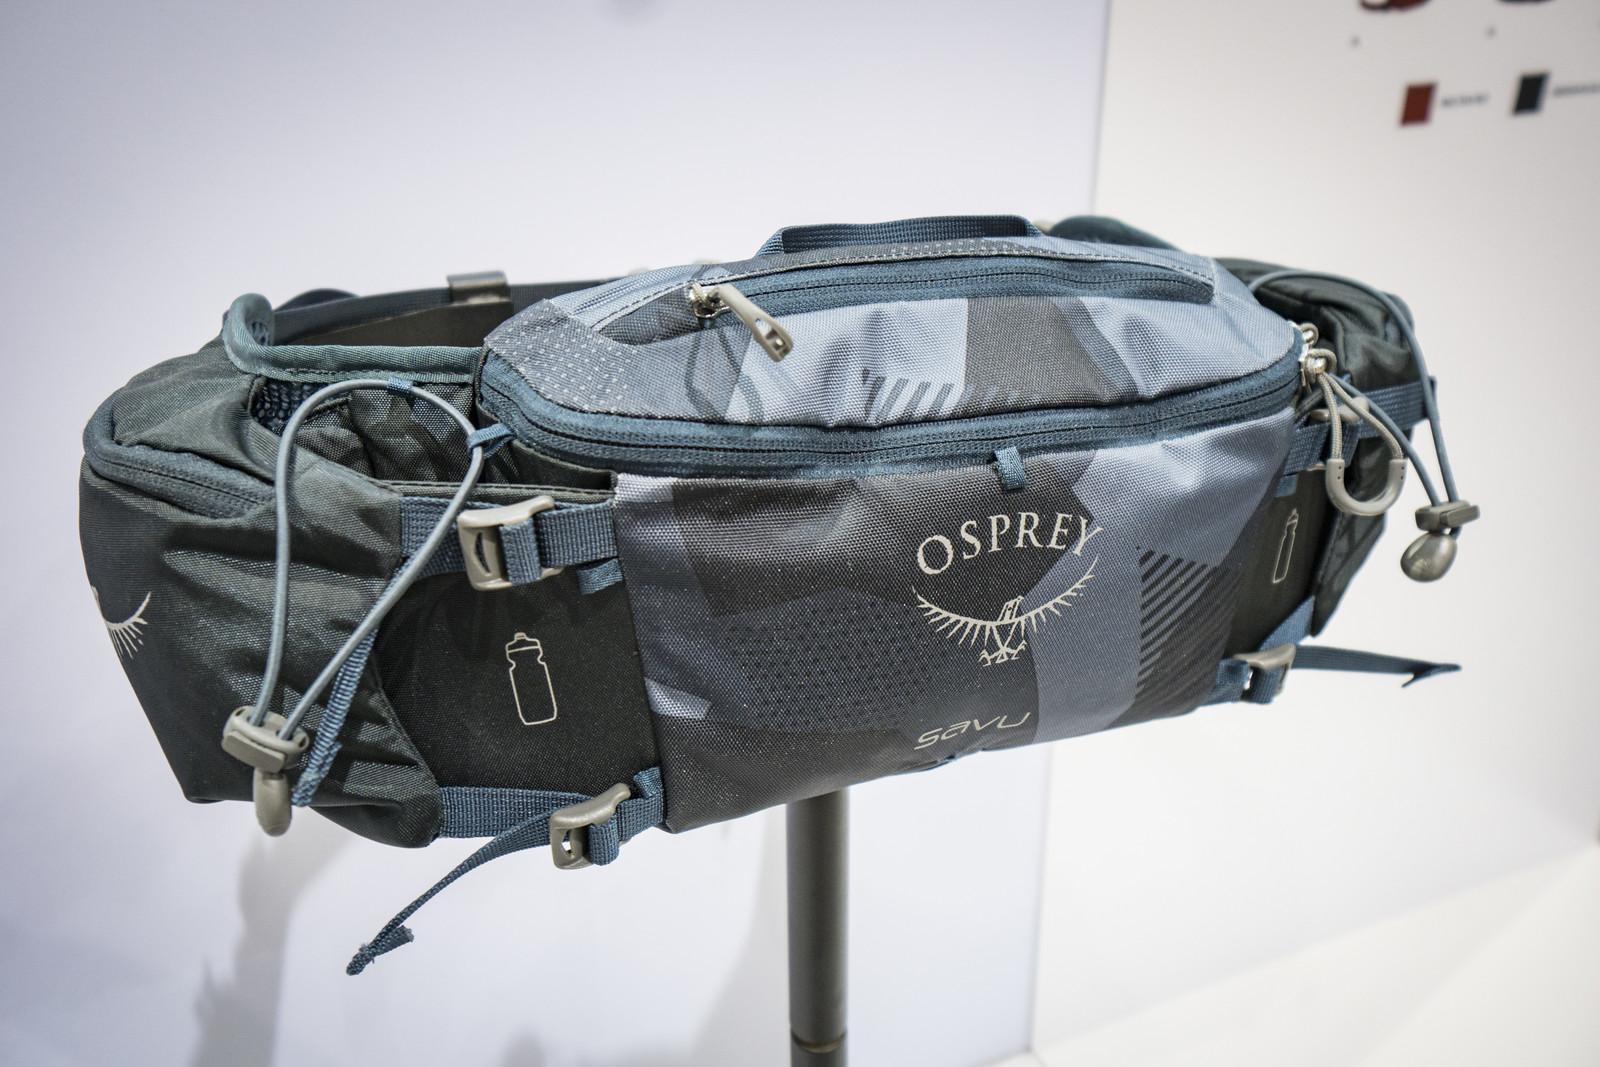 Osprey Savu